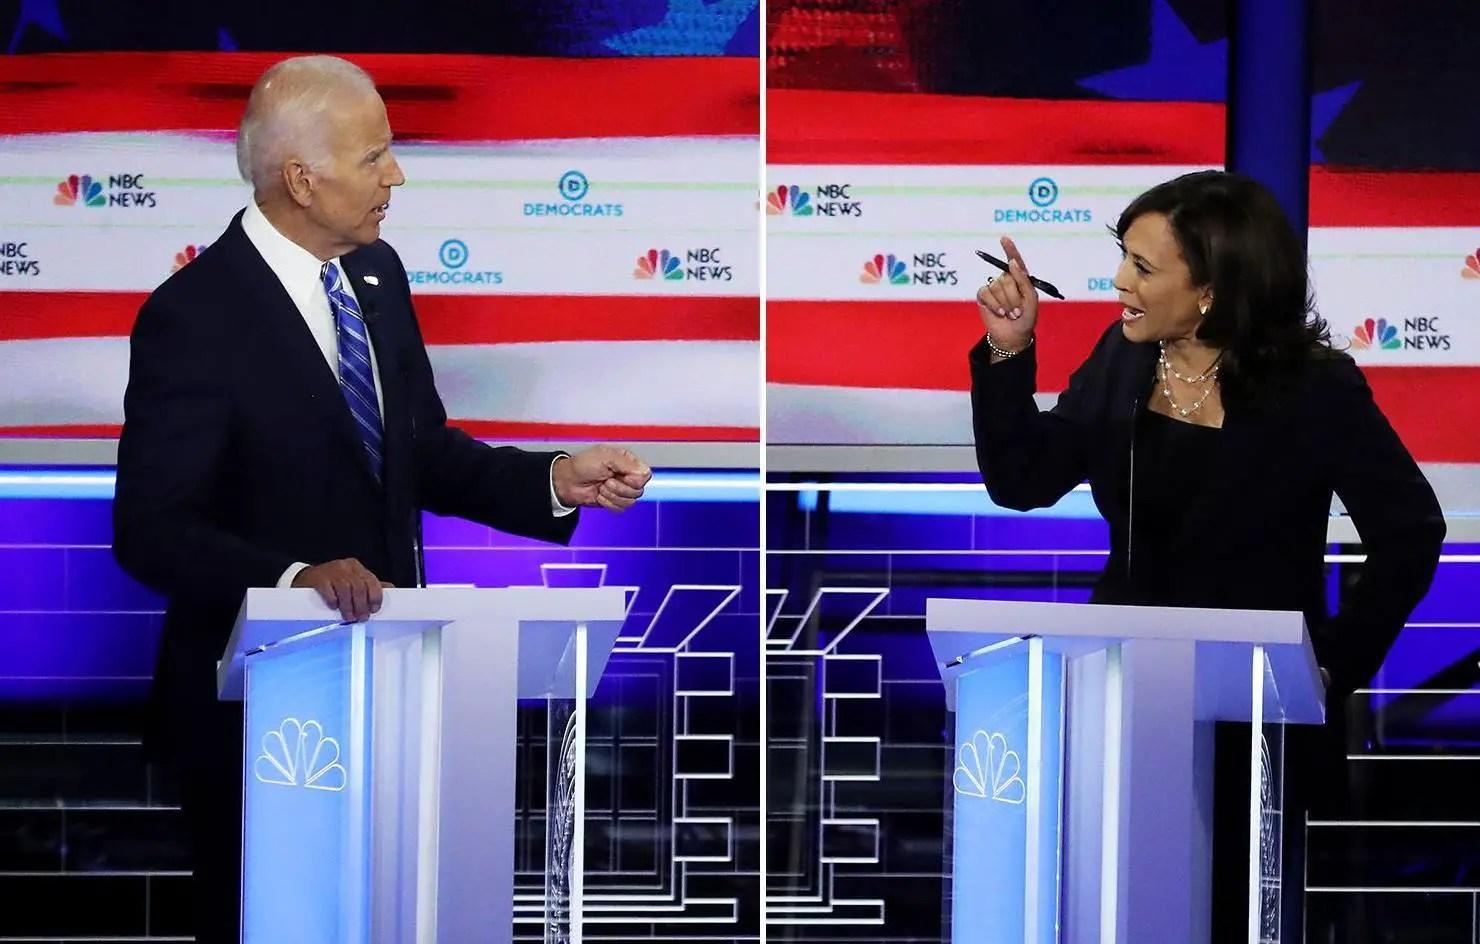 Post Democratic Debate Kamala Harris Registers Rise in Supporters